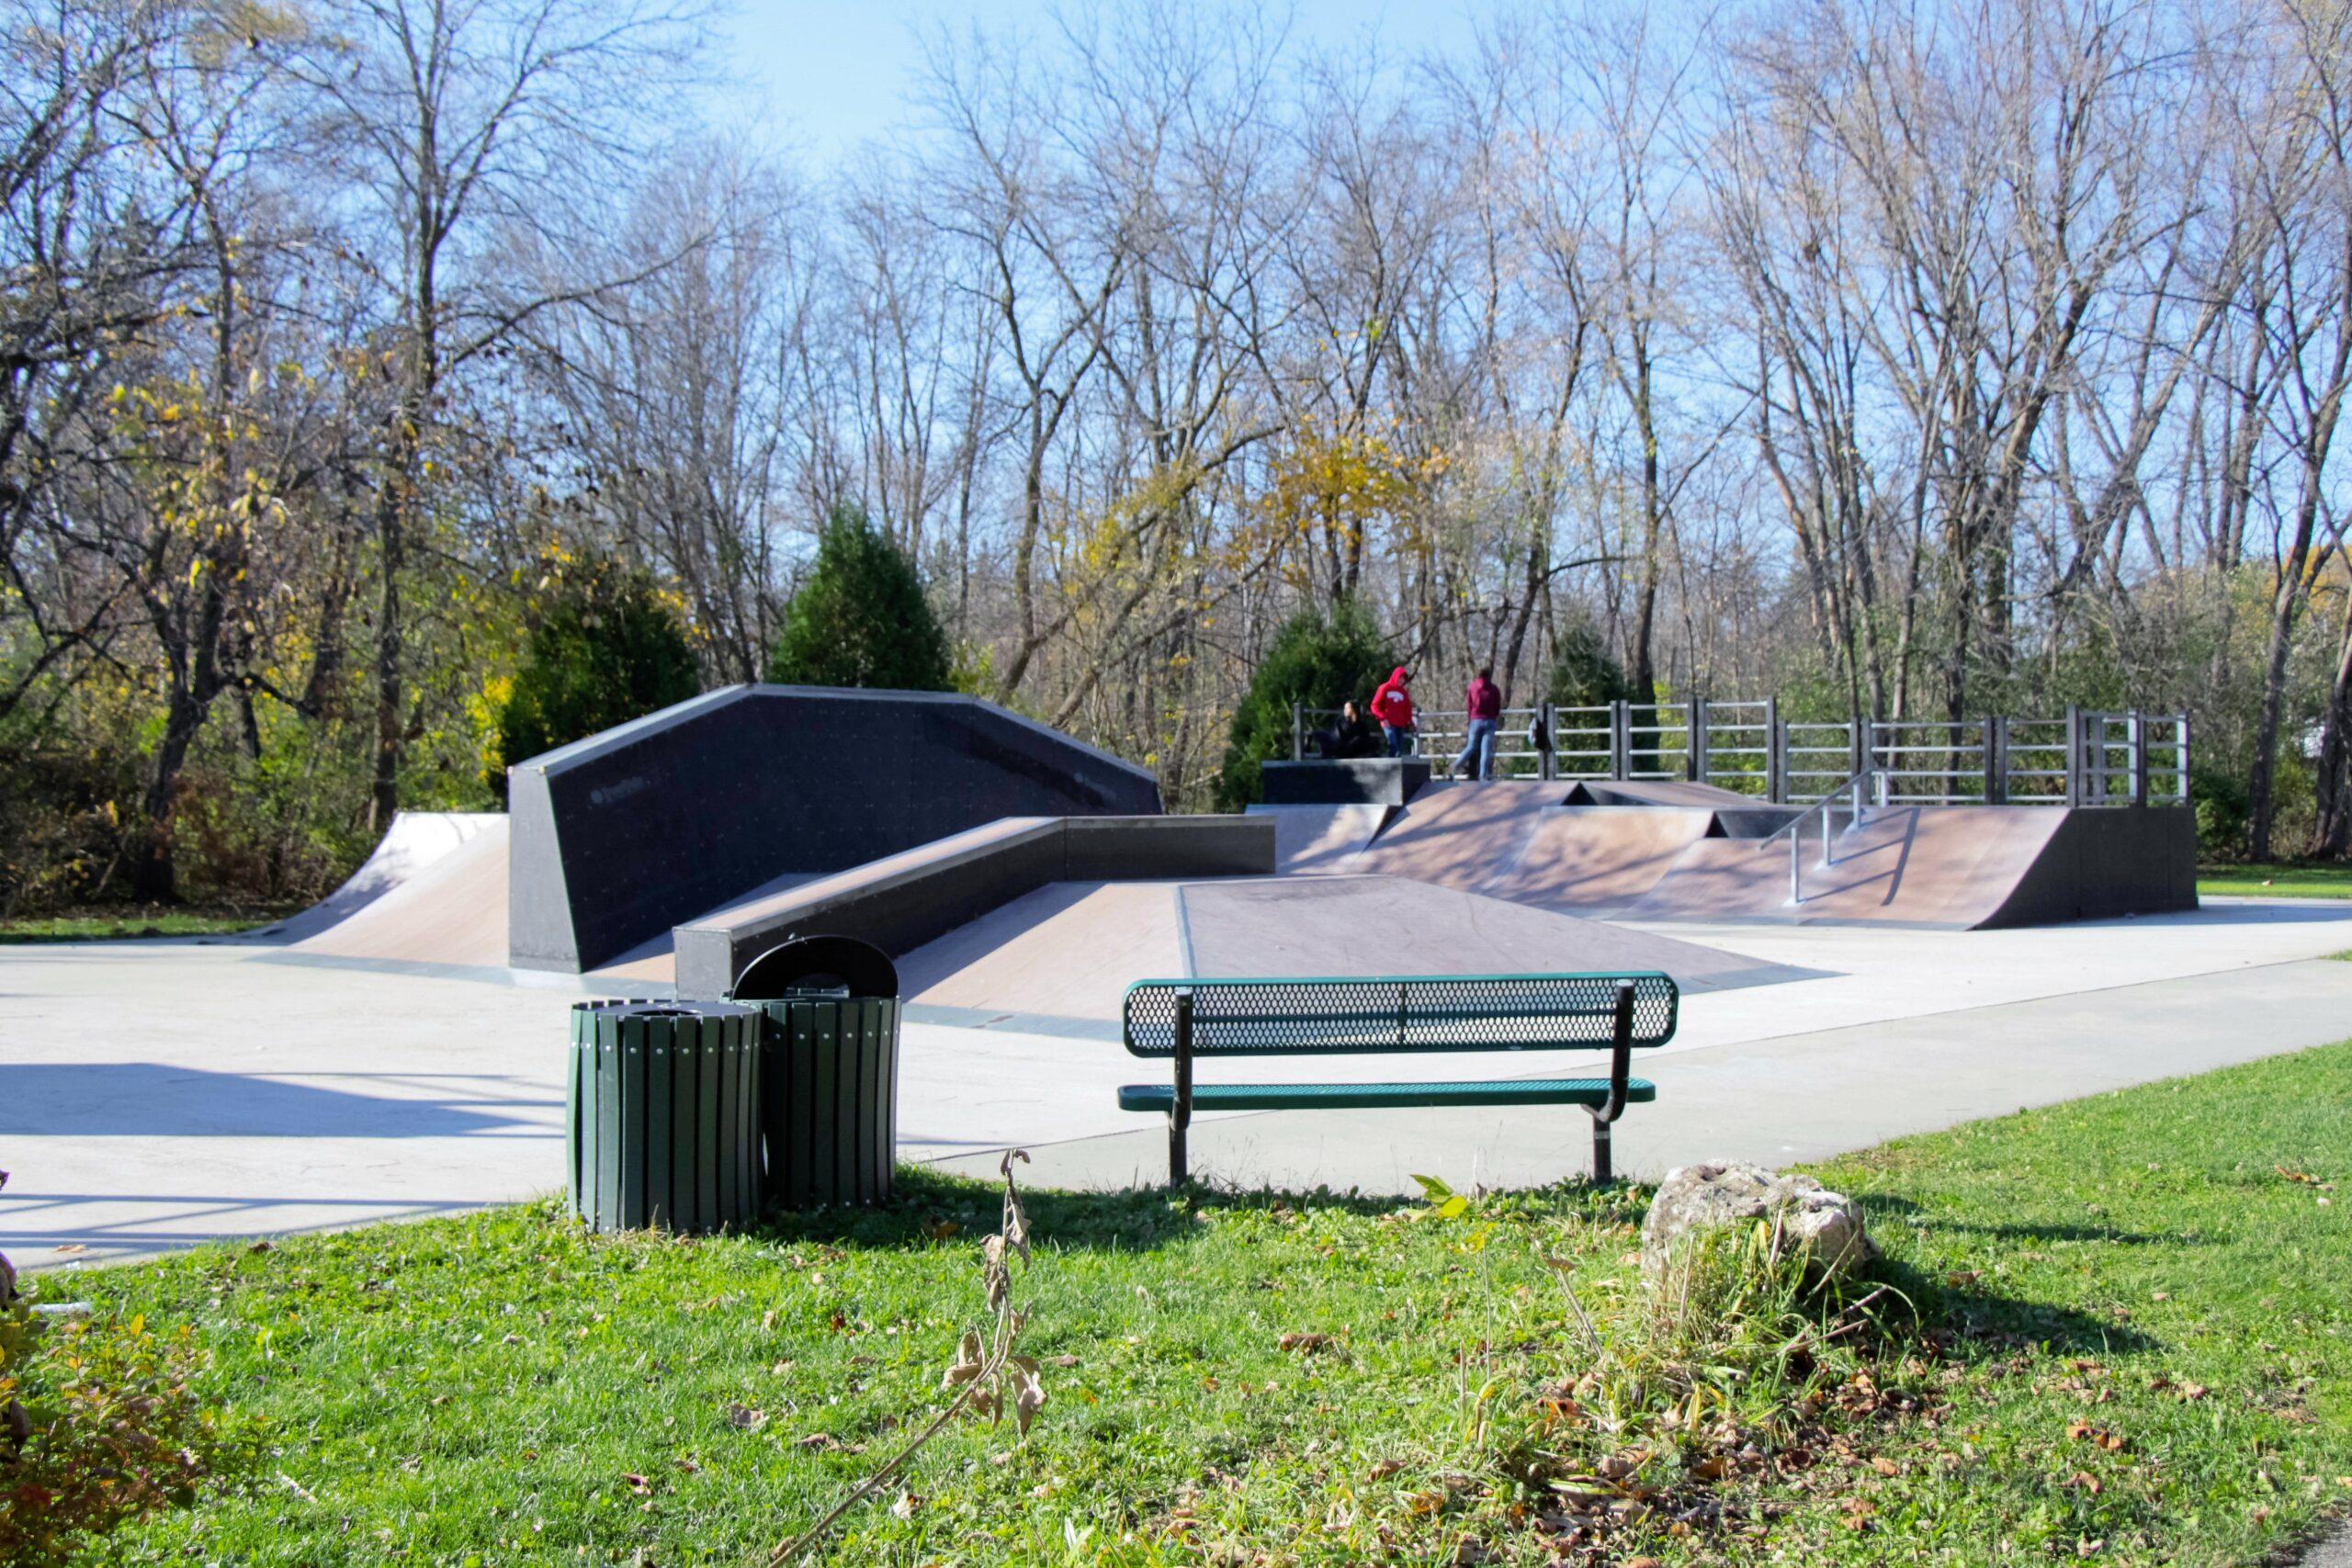 Rotary Skate Park